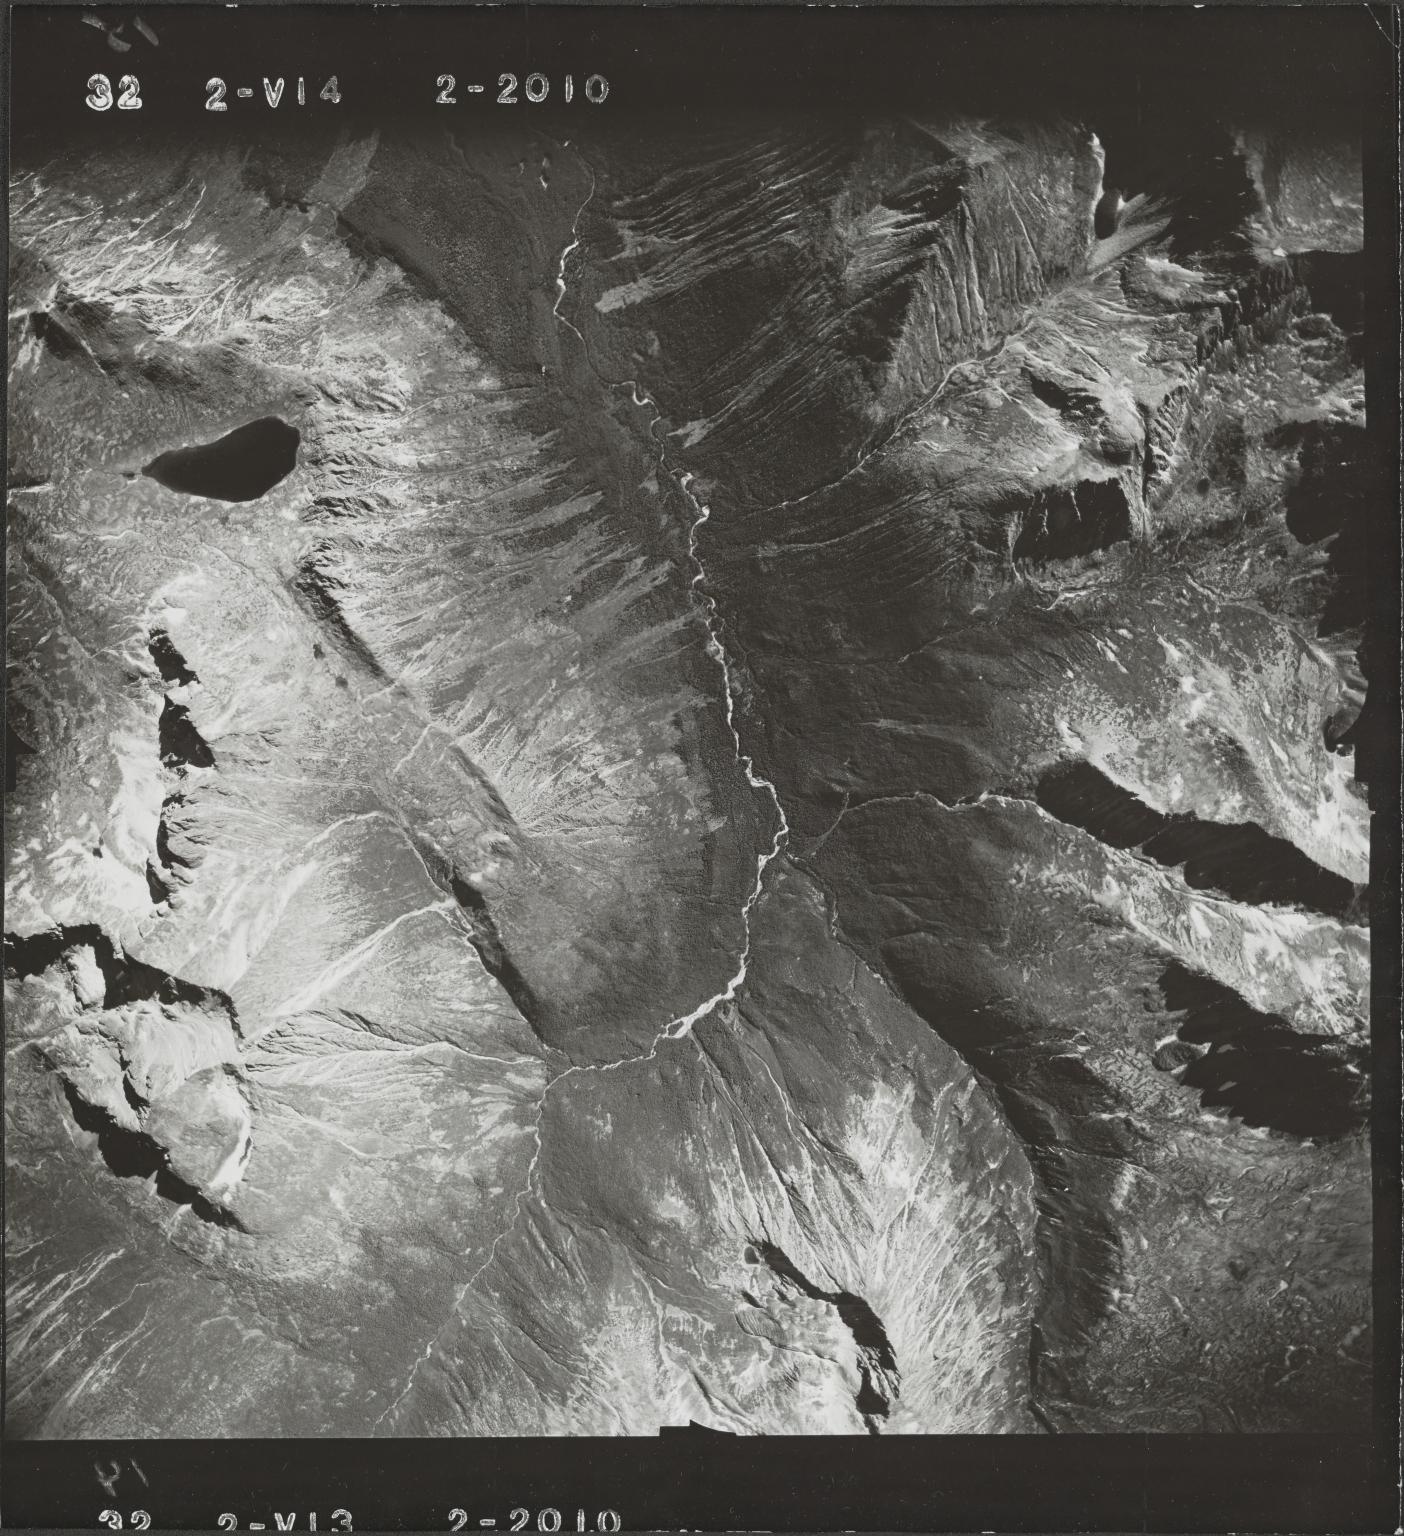 Jennings River, aerial photograph FL 47 V-14, British Columbia